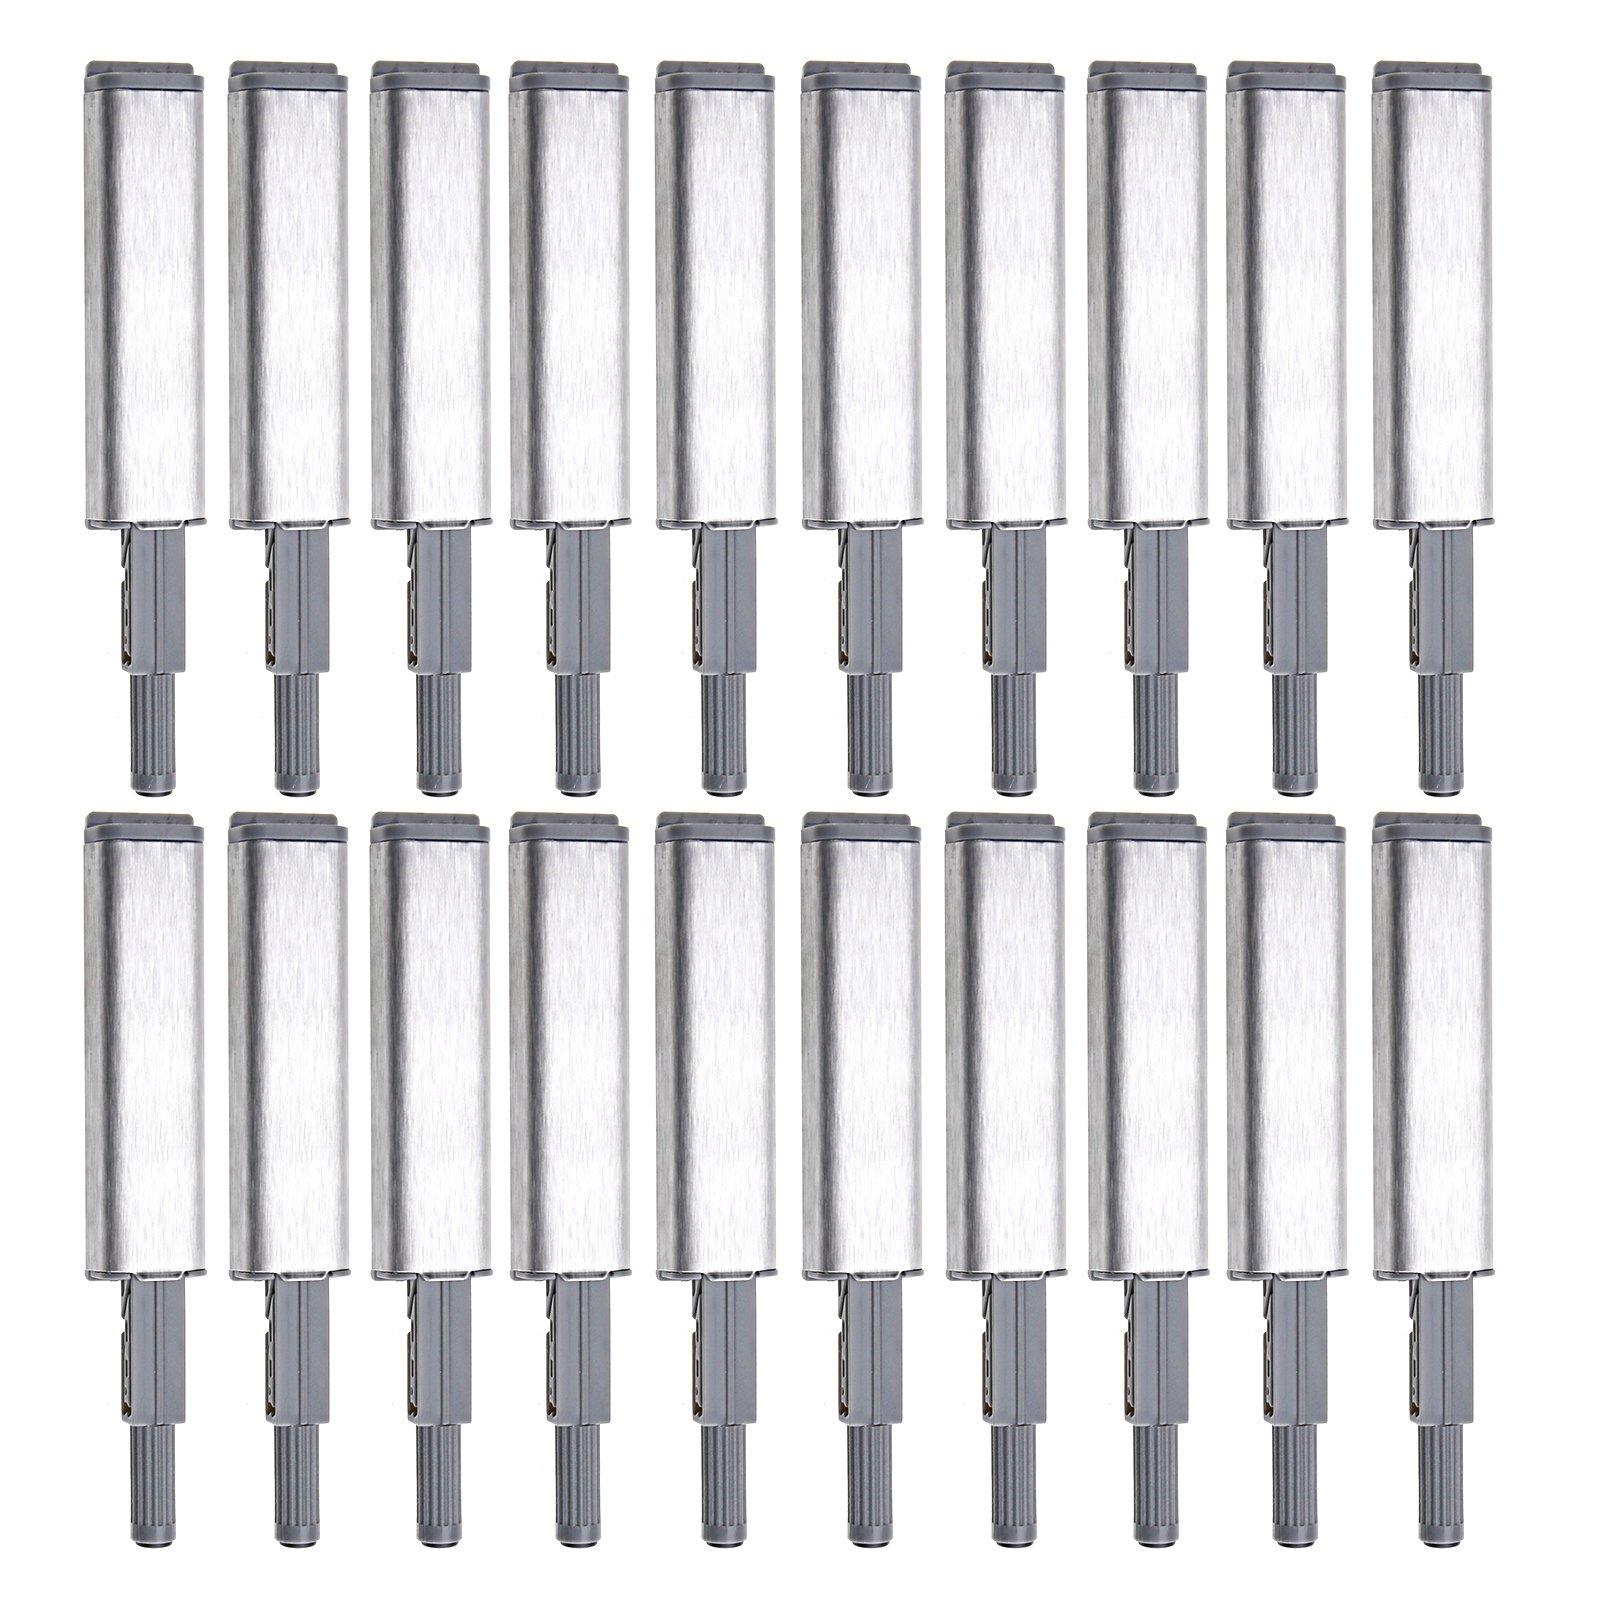 20x Cabinet Latch Door Drawer Push to Open System Damper Buffer Catch Set Kit